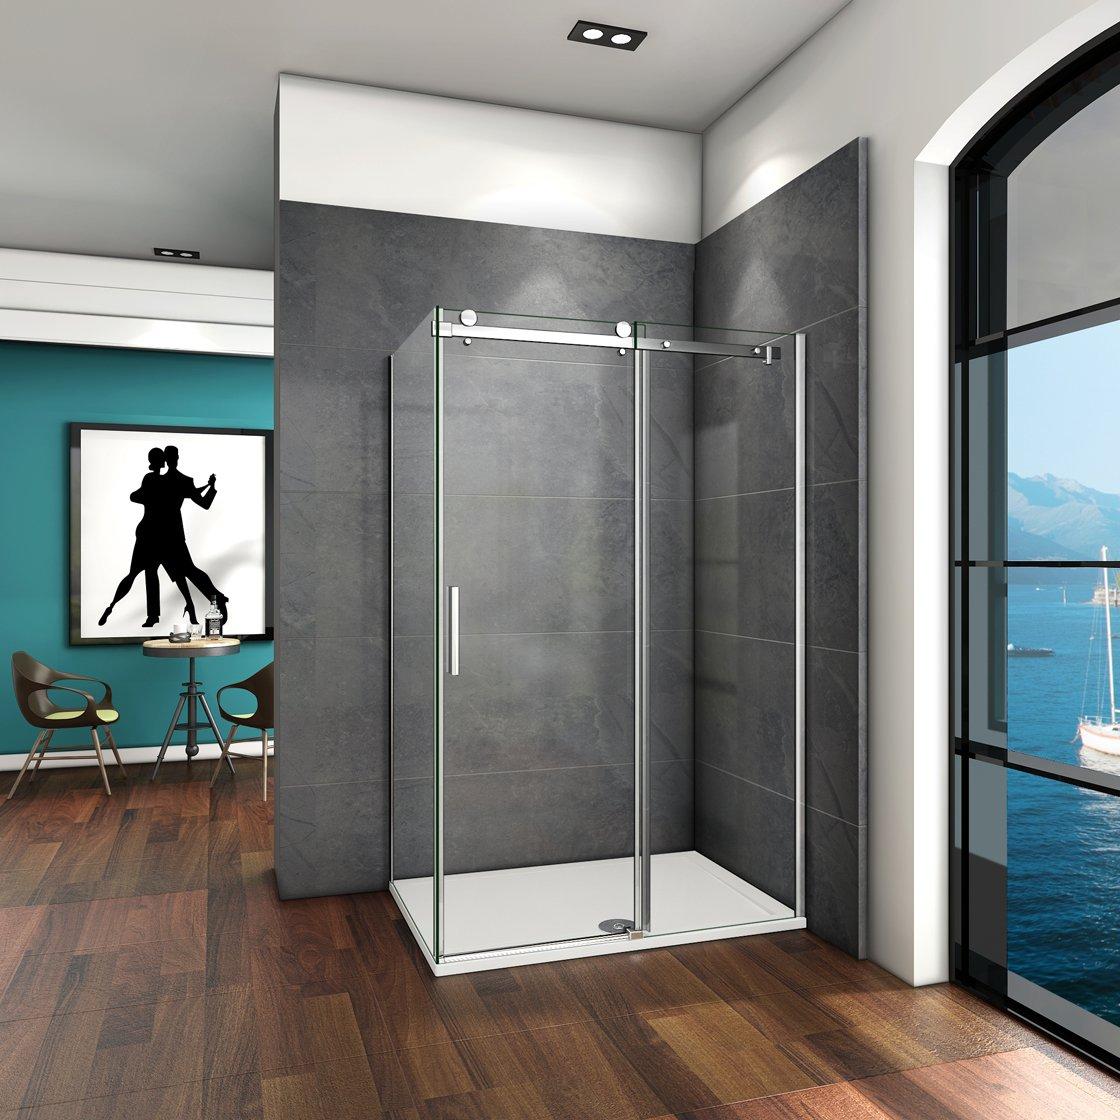 130 x 195 cabinas de ducha Mampara de ducha 6 mm transparente ...